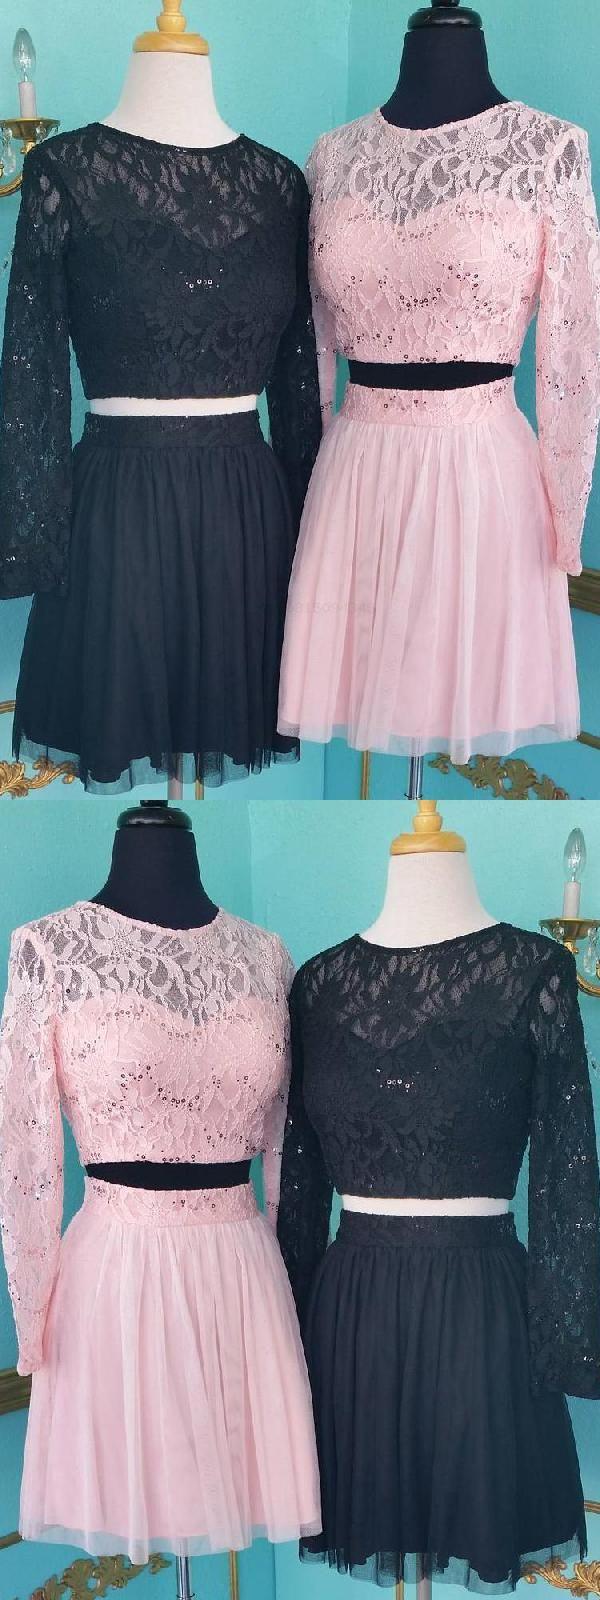 Homecoming dresses two piece prom dress short black prom dress